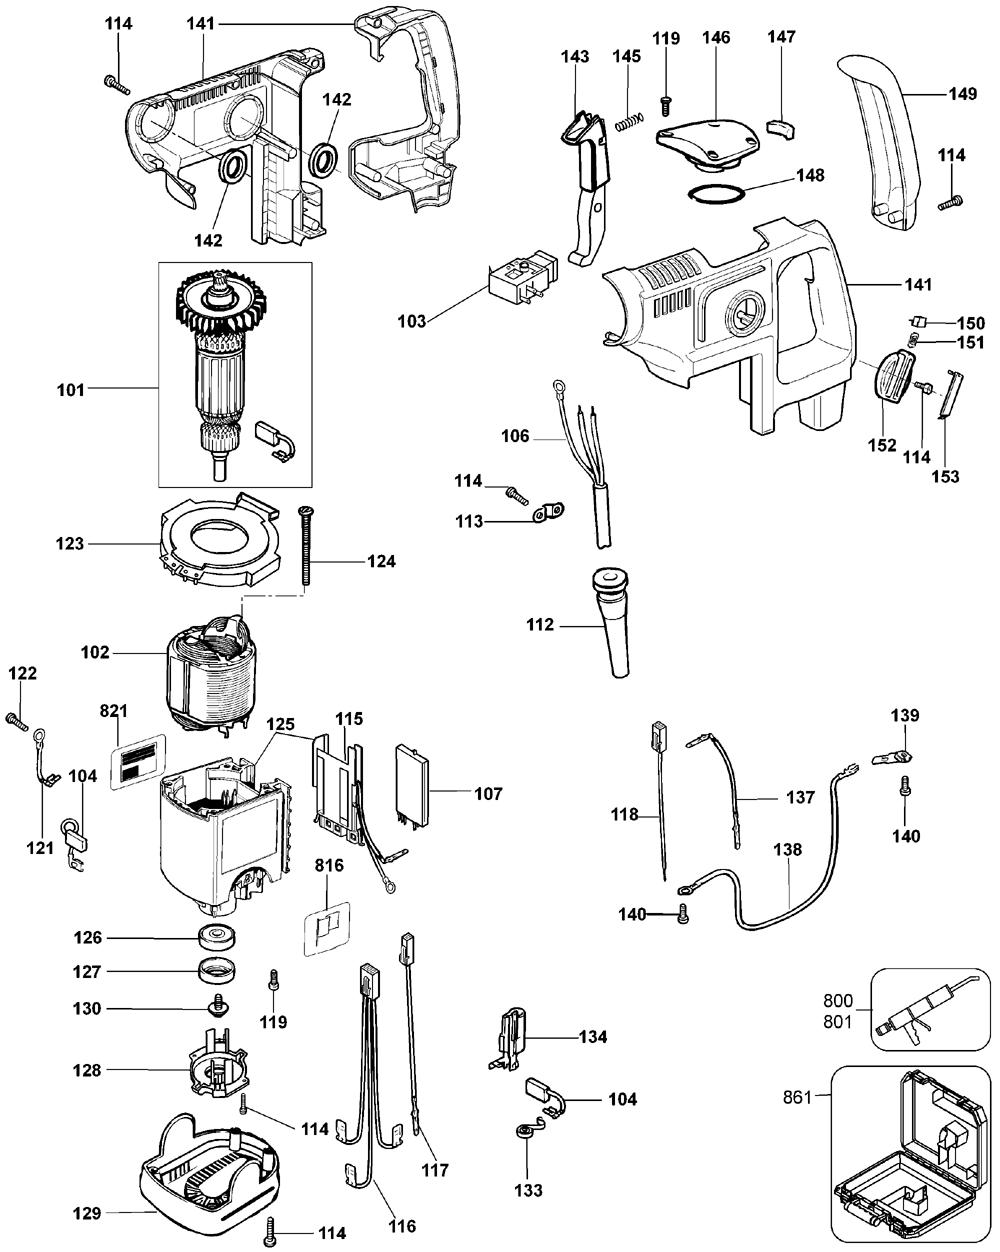 D25404K-T3-Dewalt-PB-1Break Down